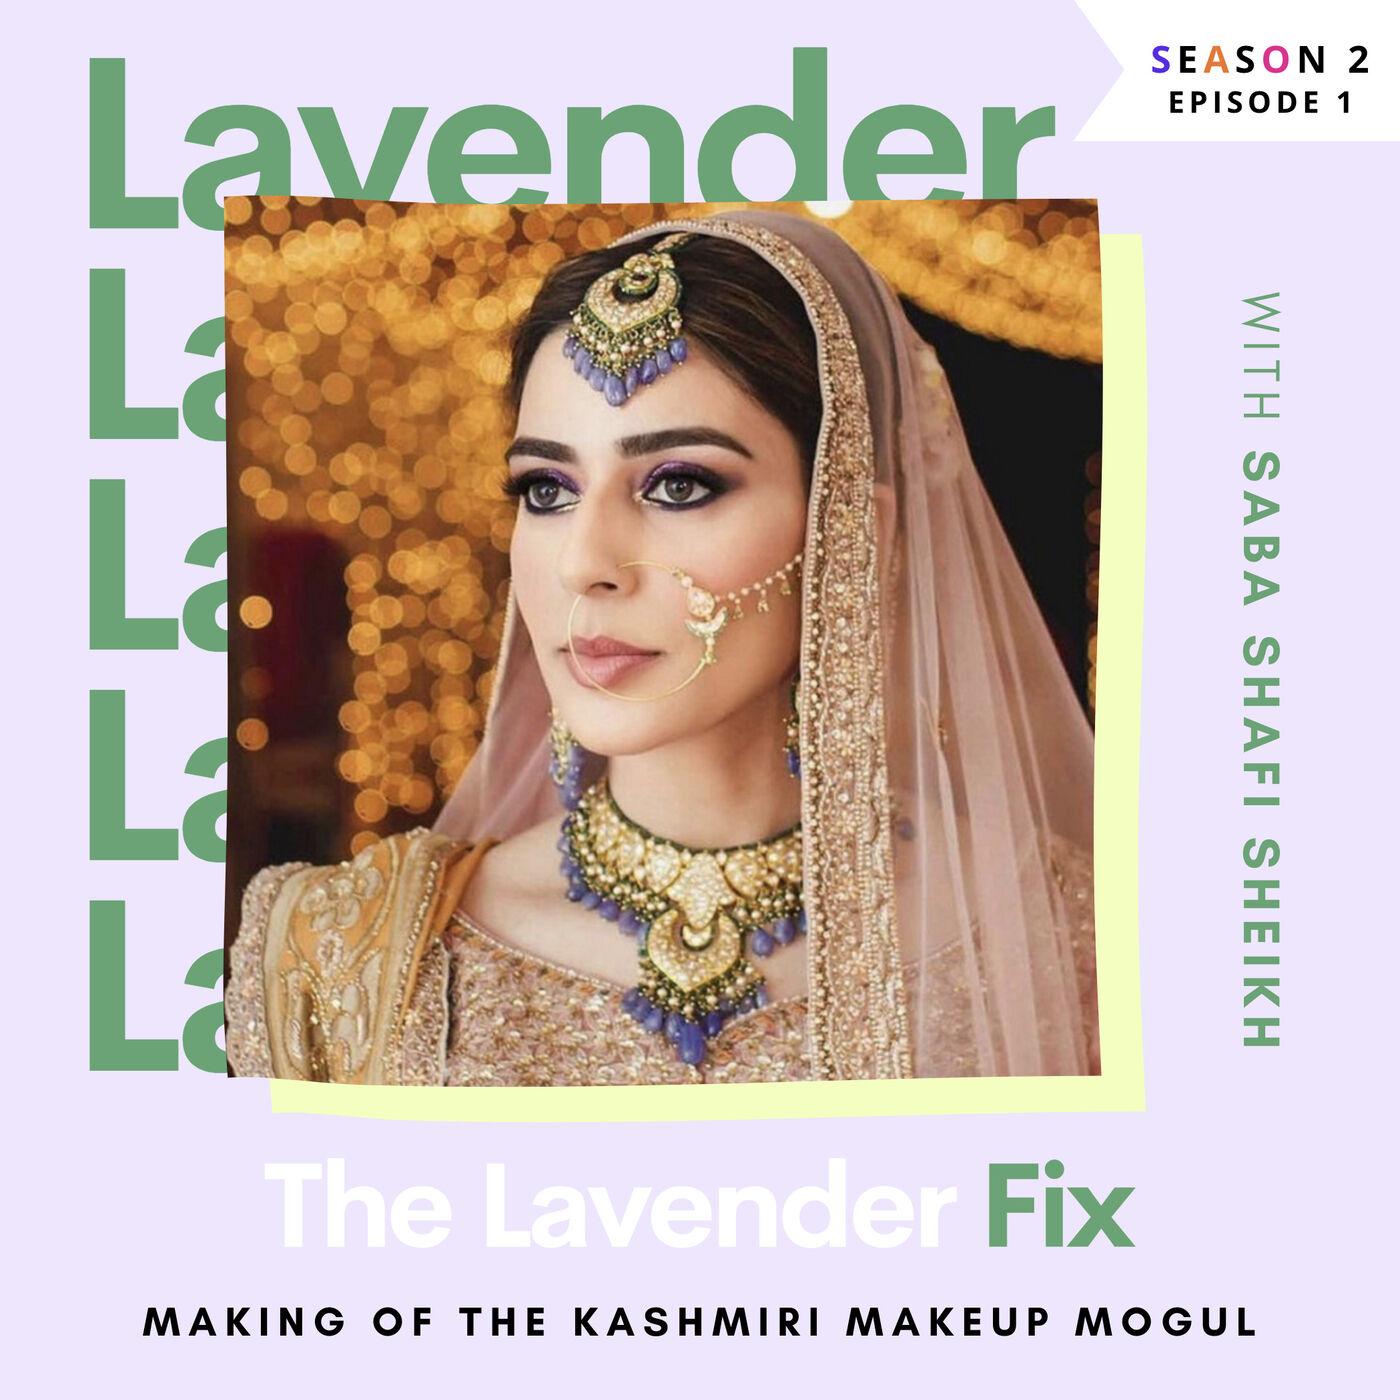 Makeup By Saba - The Kashmiri Makeup Mogul with Saba Shafi Sheikh